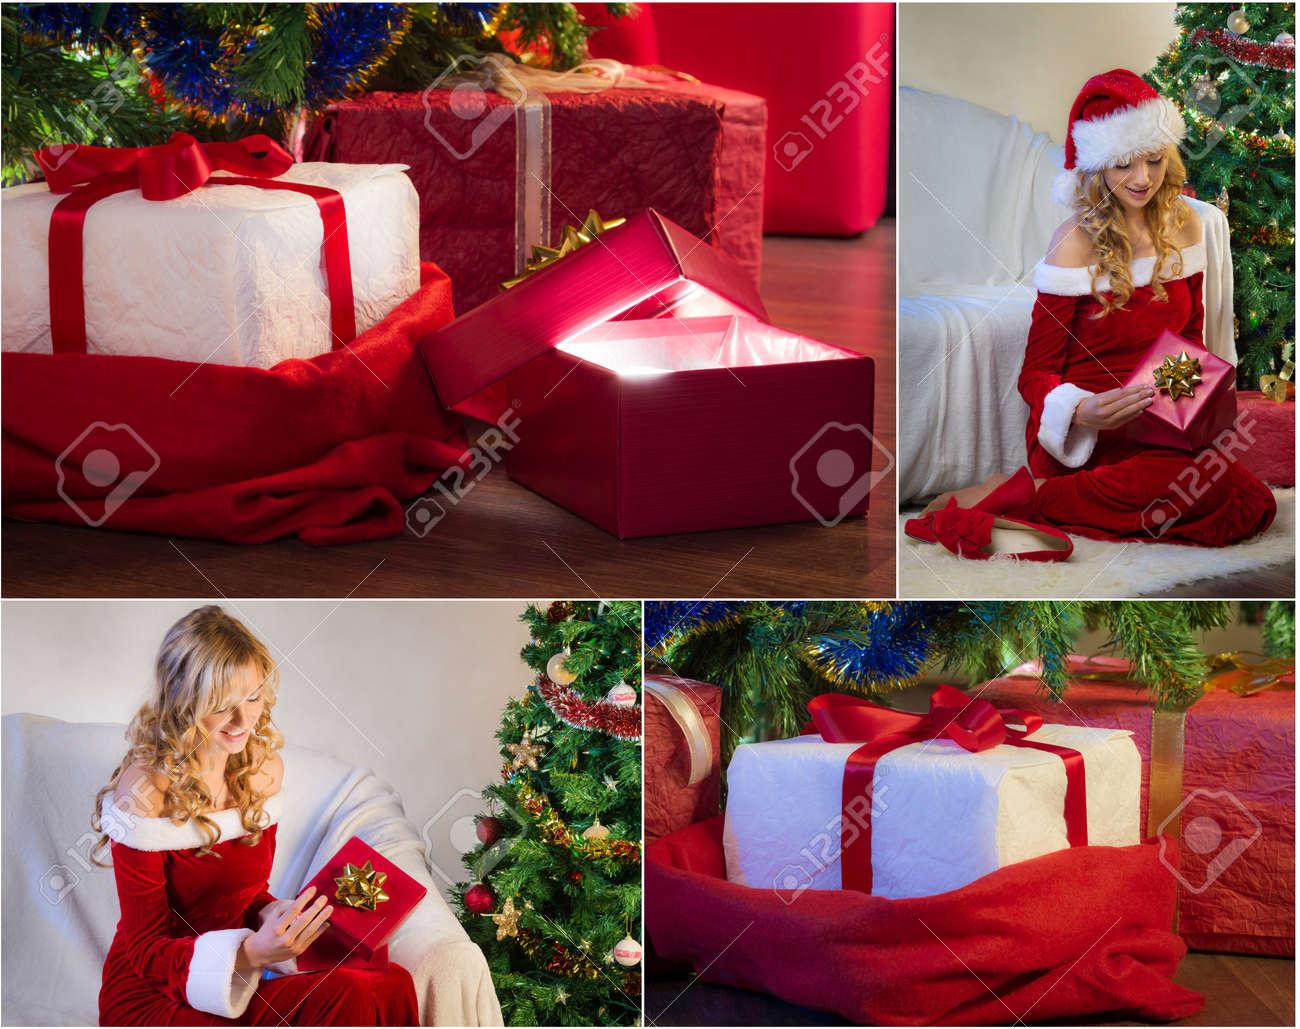 Postcard For Christmas With Christmas Tree And Gifts No. 2 Stock ...